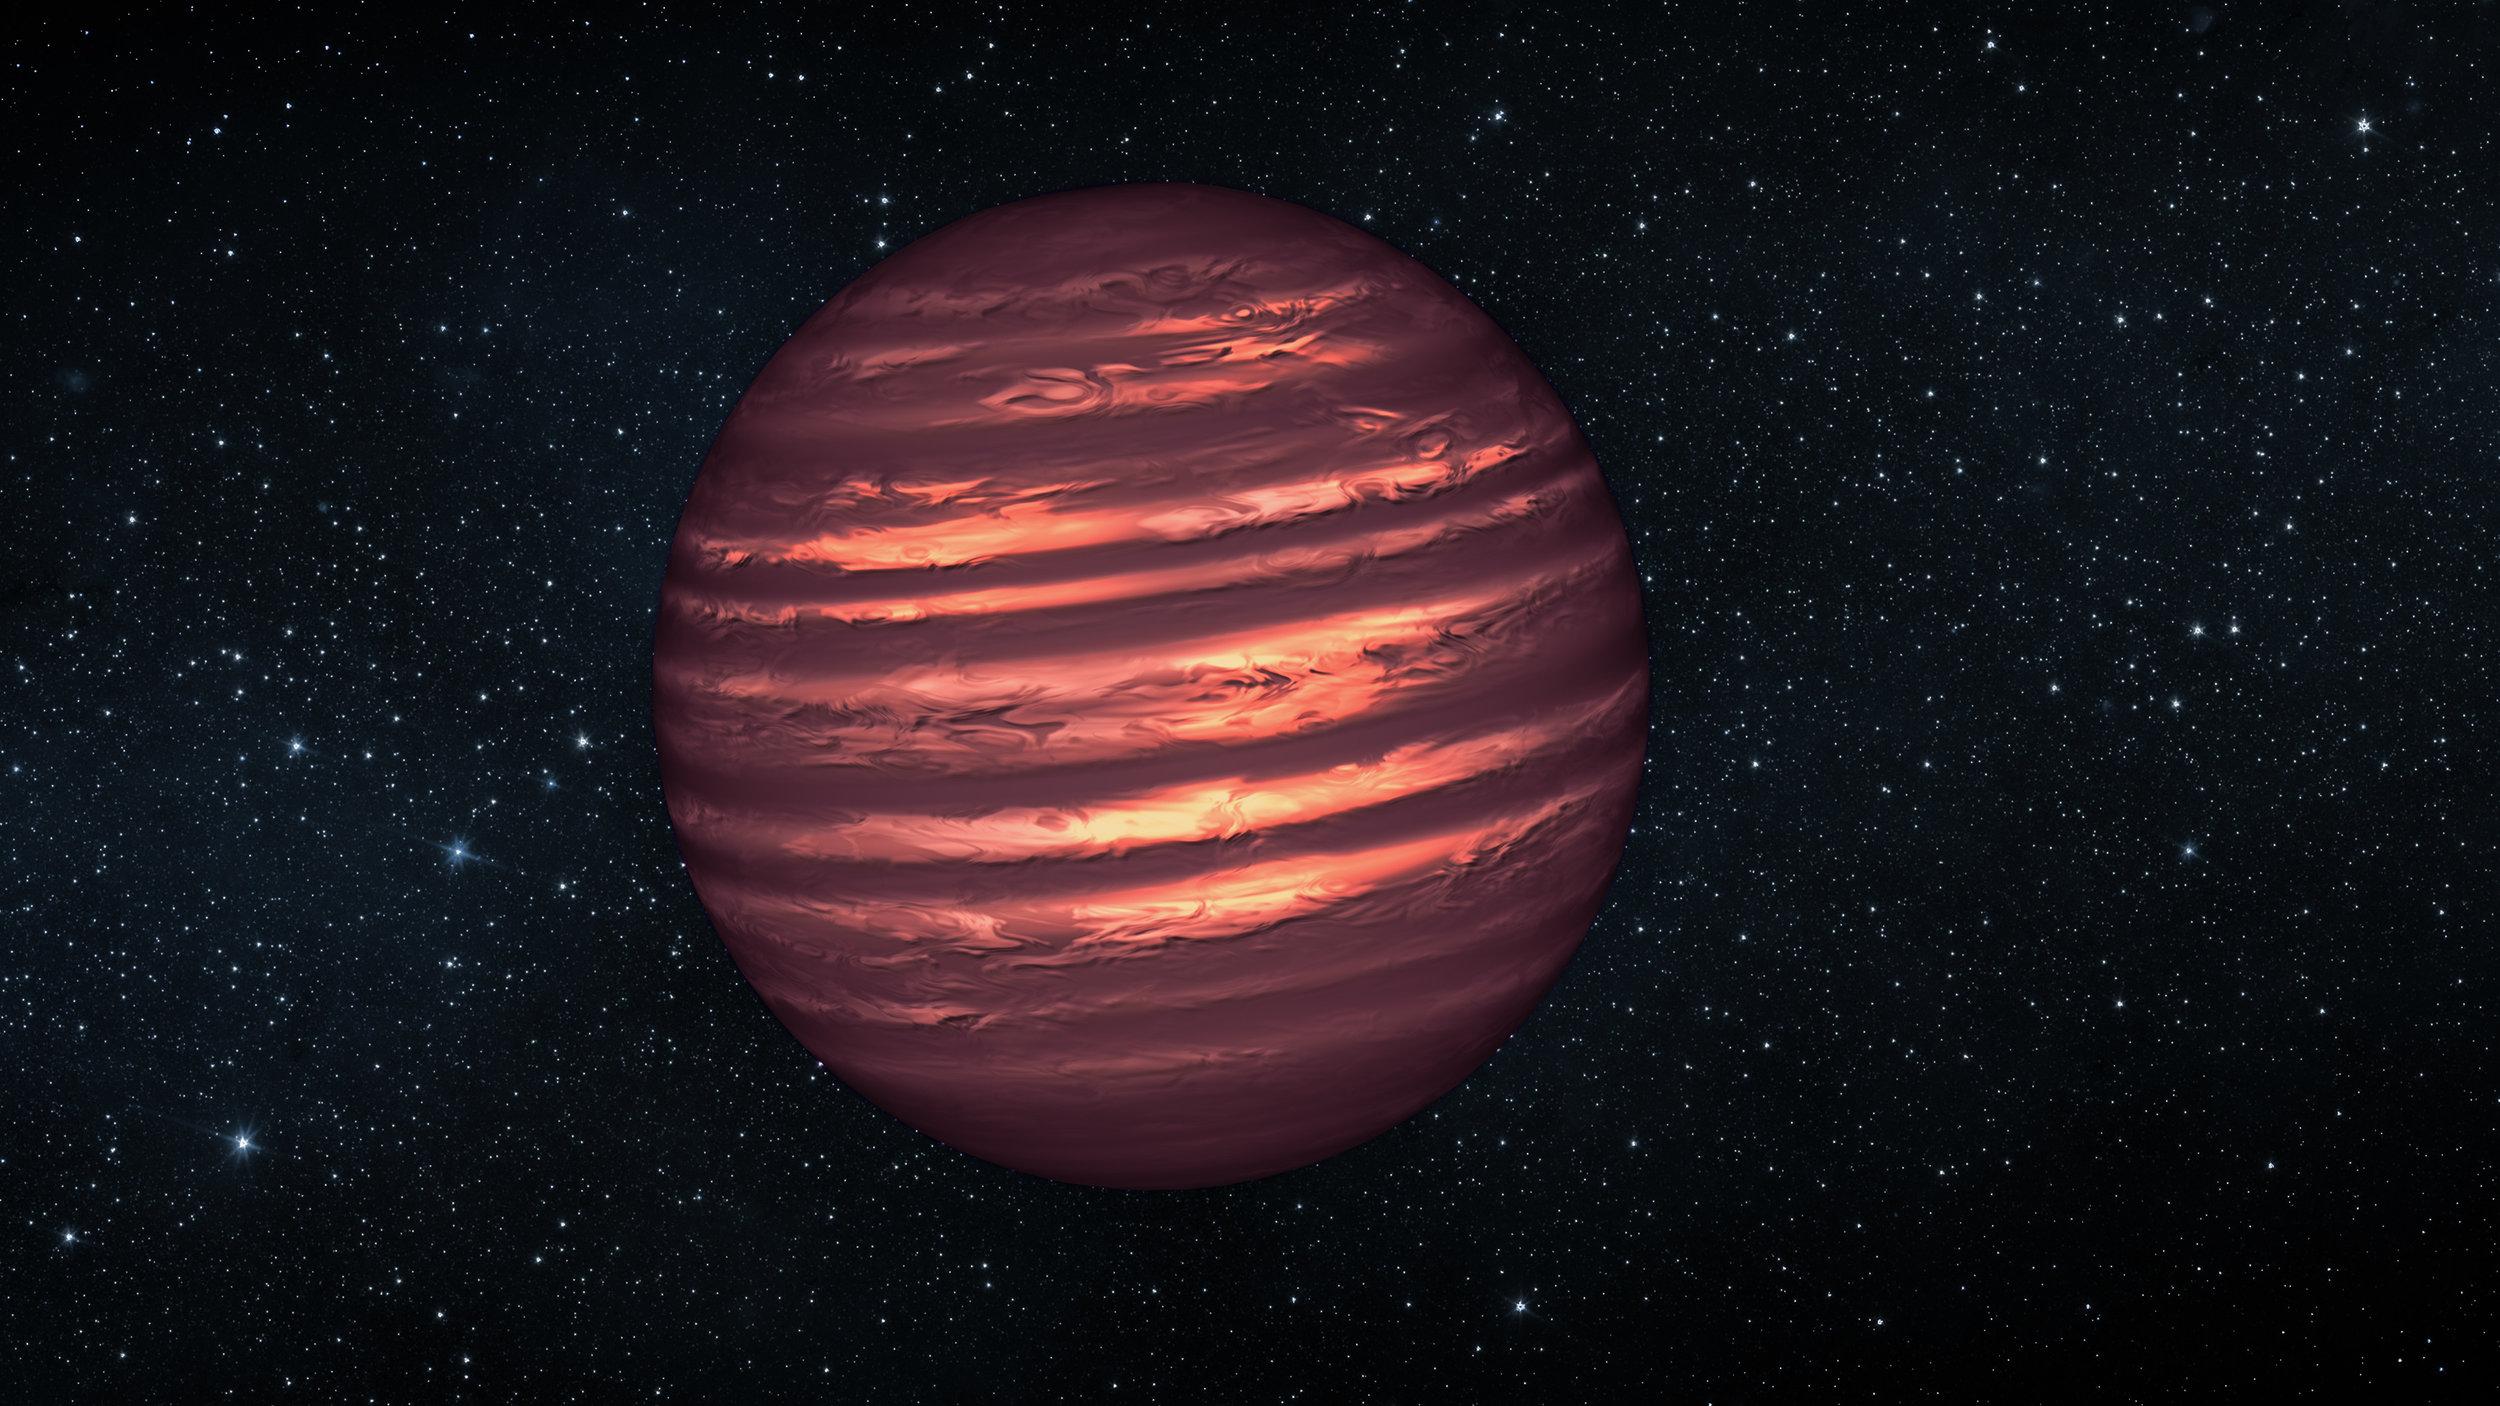 Image credit:NASA/ESA/JPL